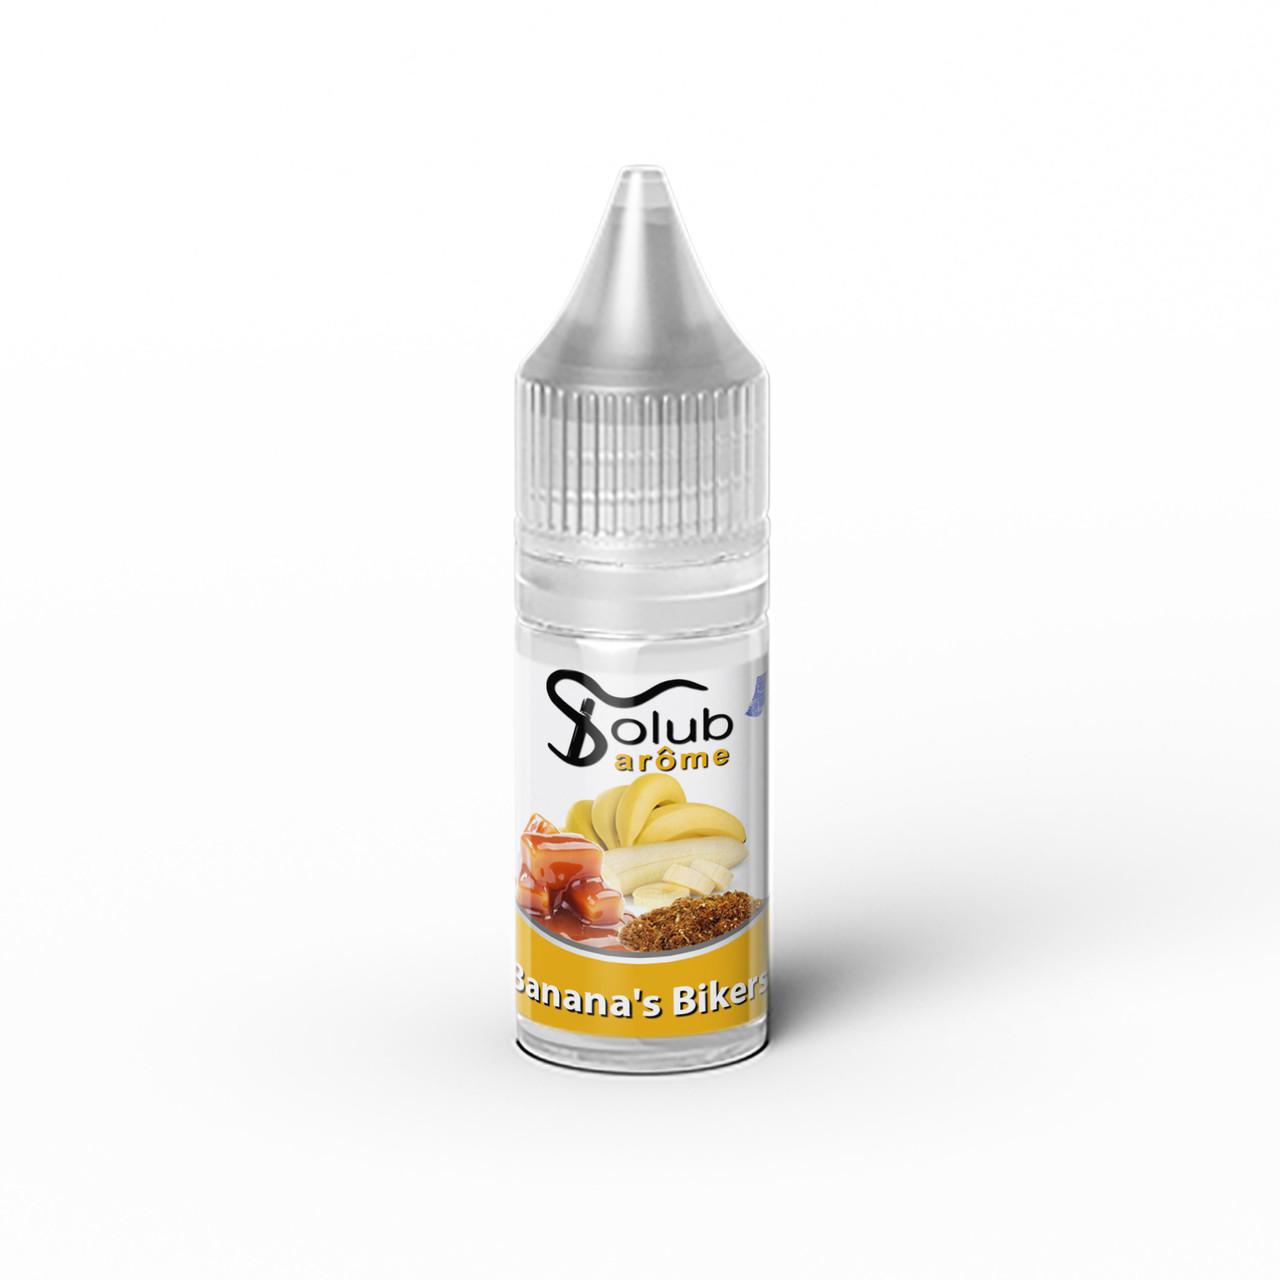 Ароматизатор Solub Arome - Banana's Bikers (М'який смак тютюну з бананом), 10 мл